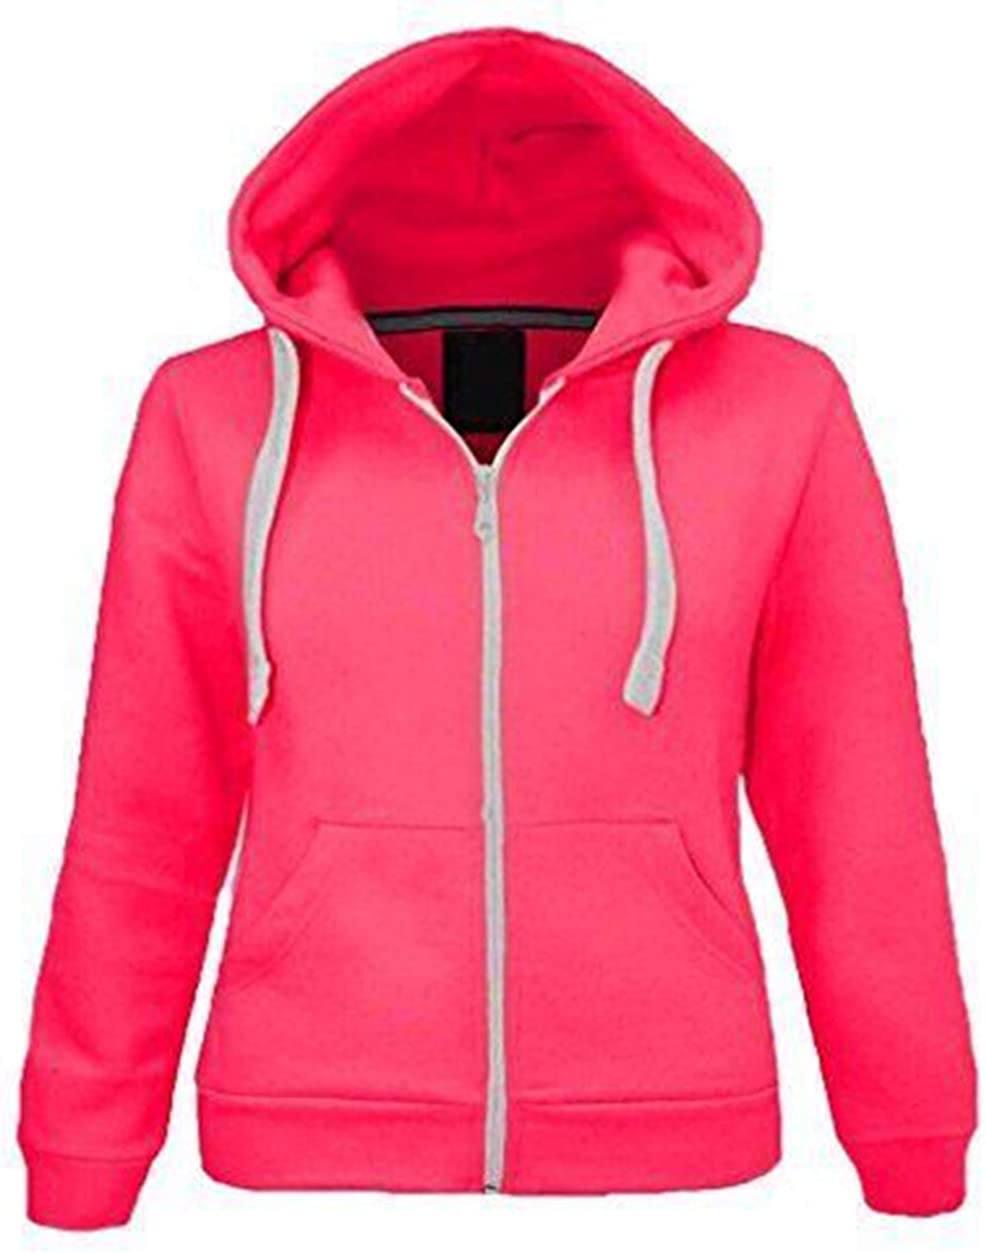 Kids Girls Unisex Plain Fleece Black Hoodie Zip Up Style Zipper Age 2-13 Years